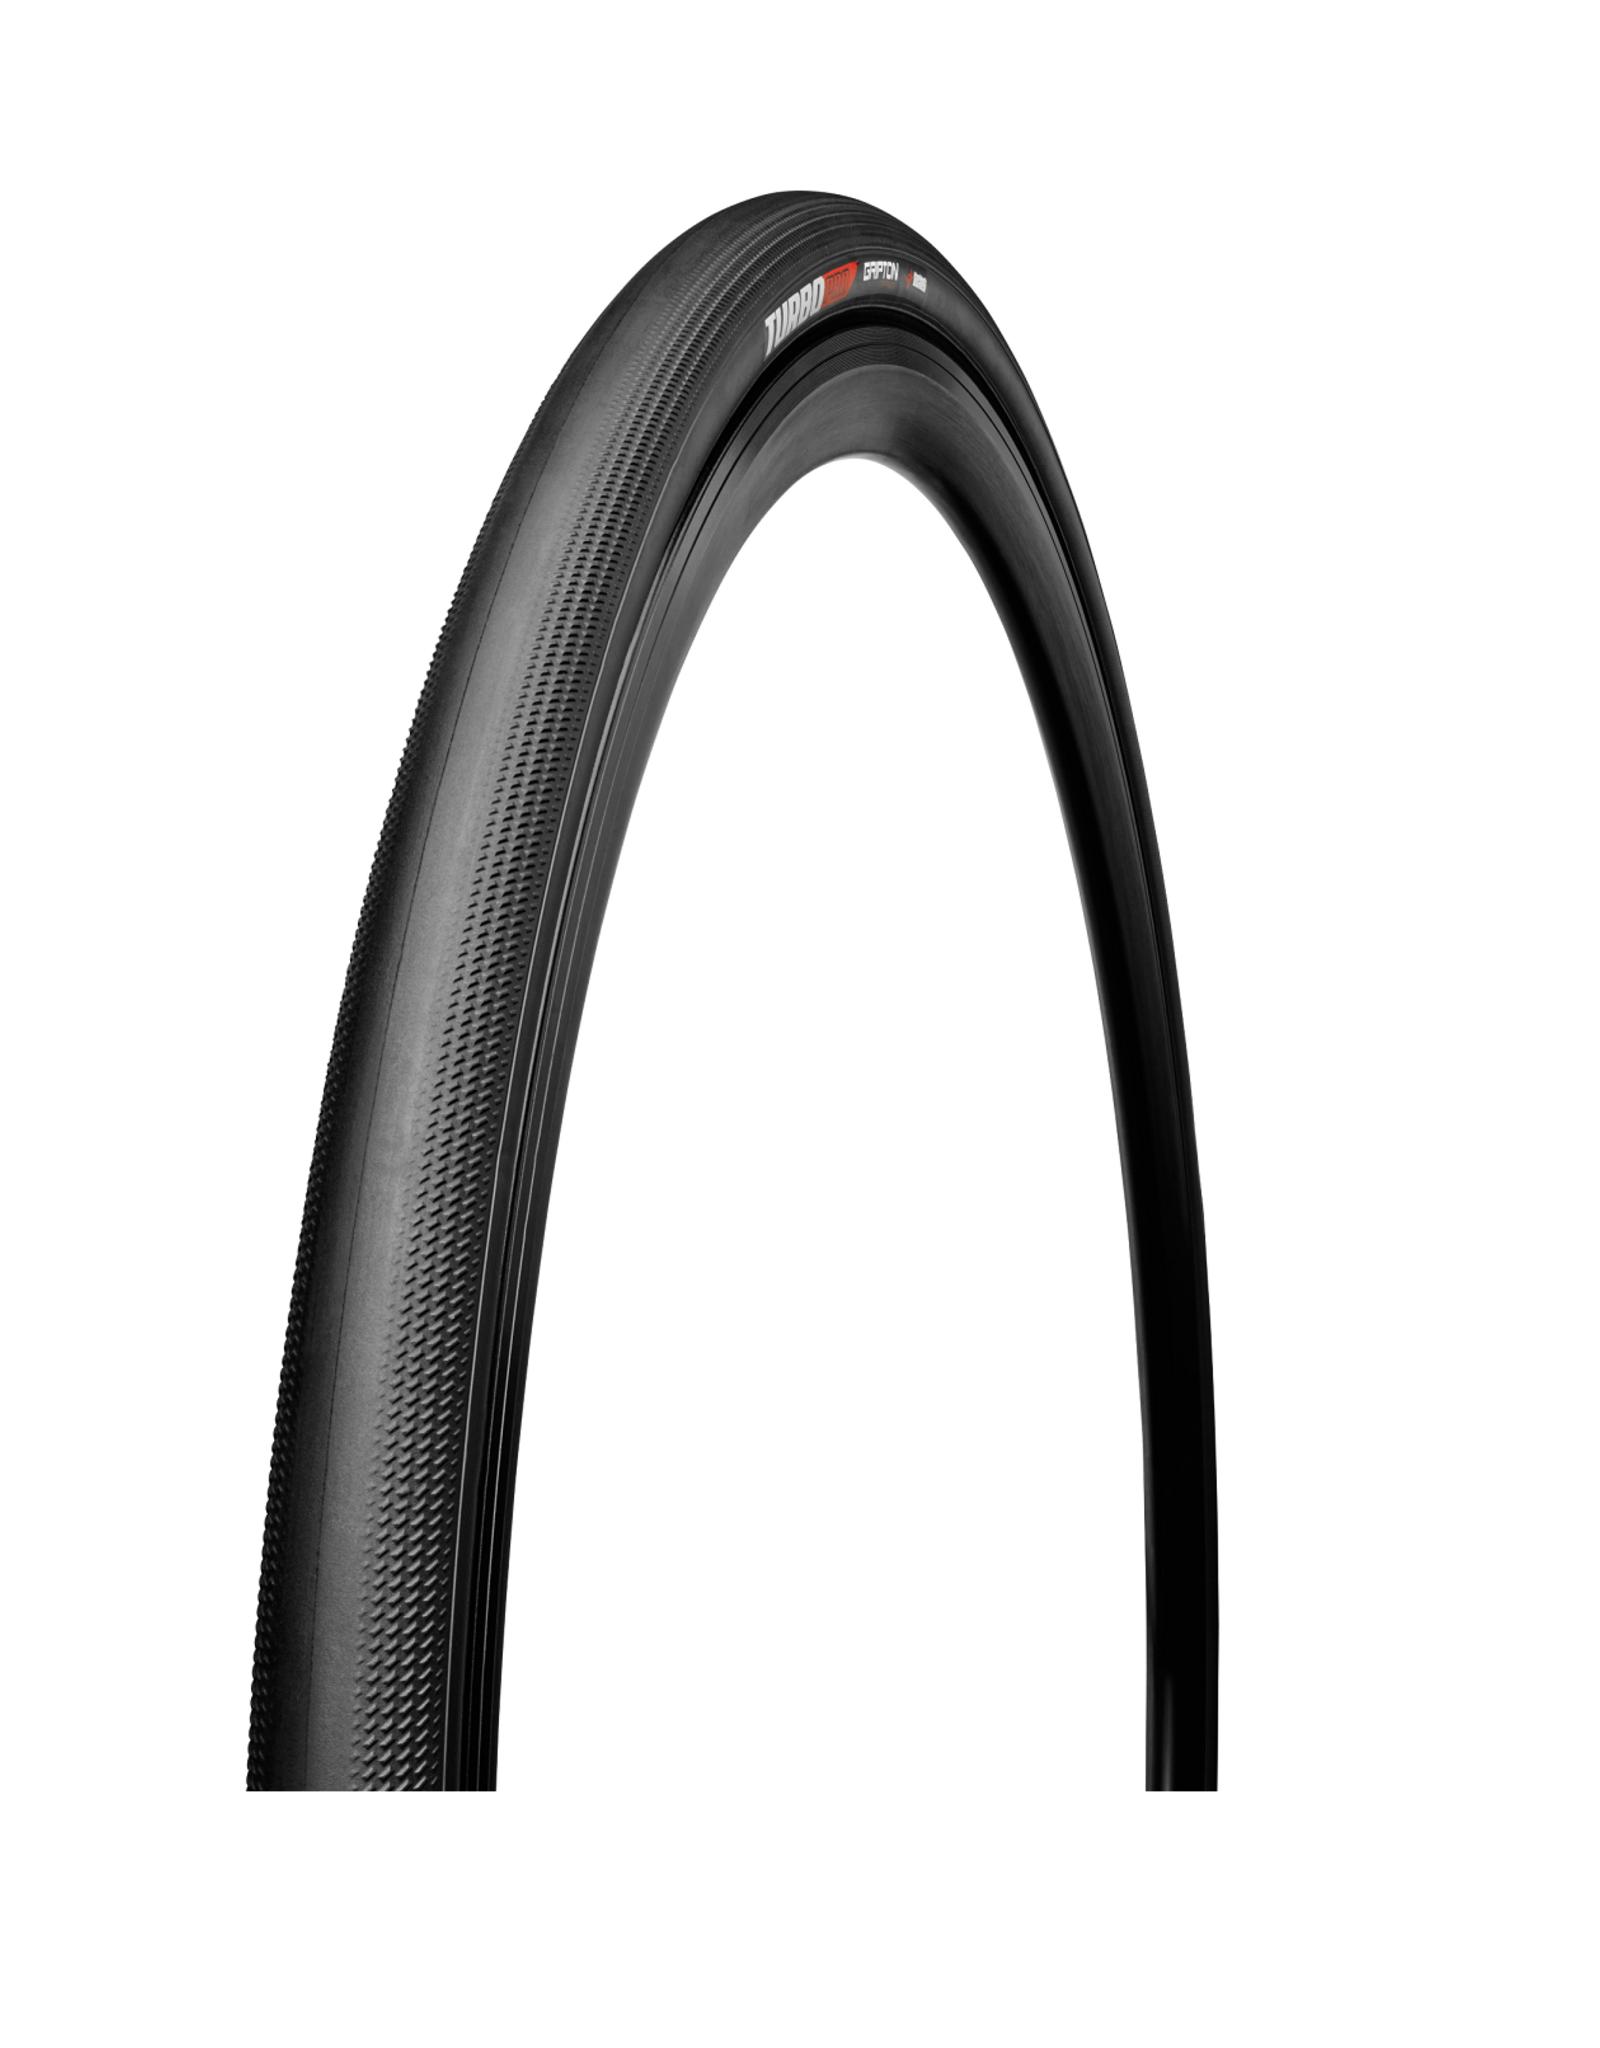 Specialized Tire - Specialized TURBO Tubeless Ready